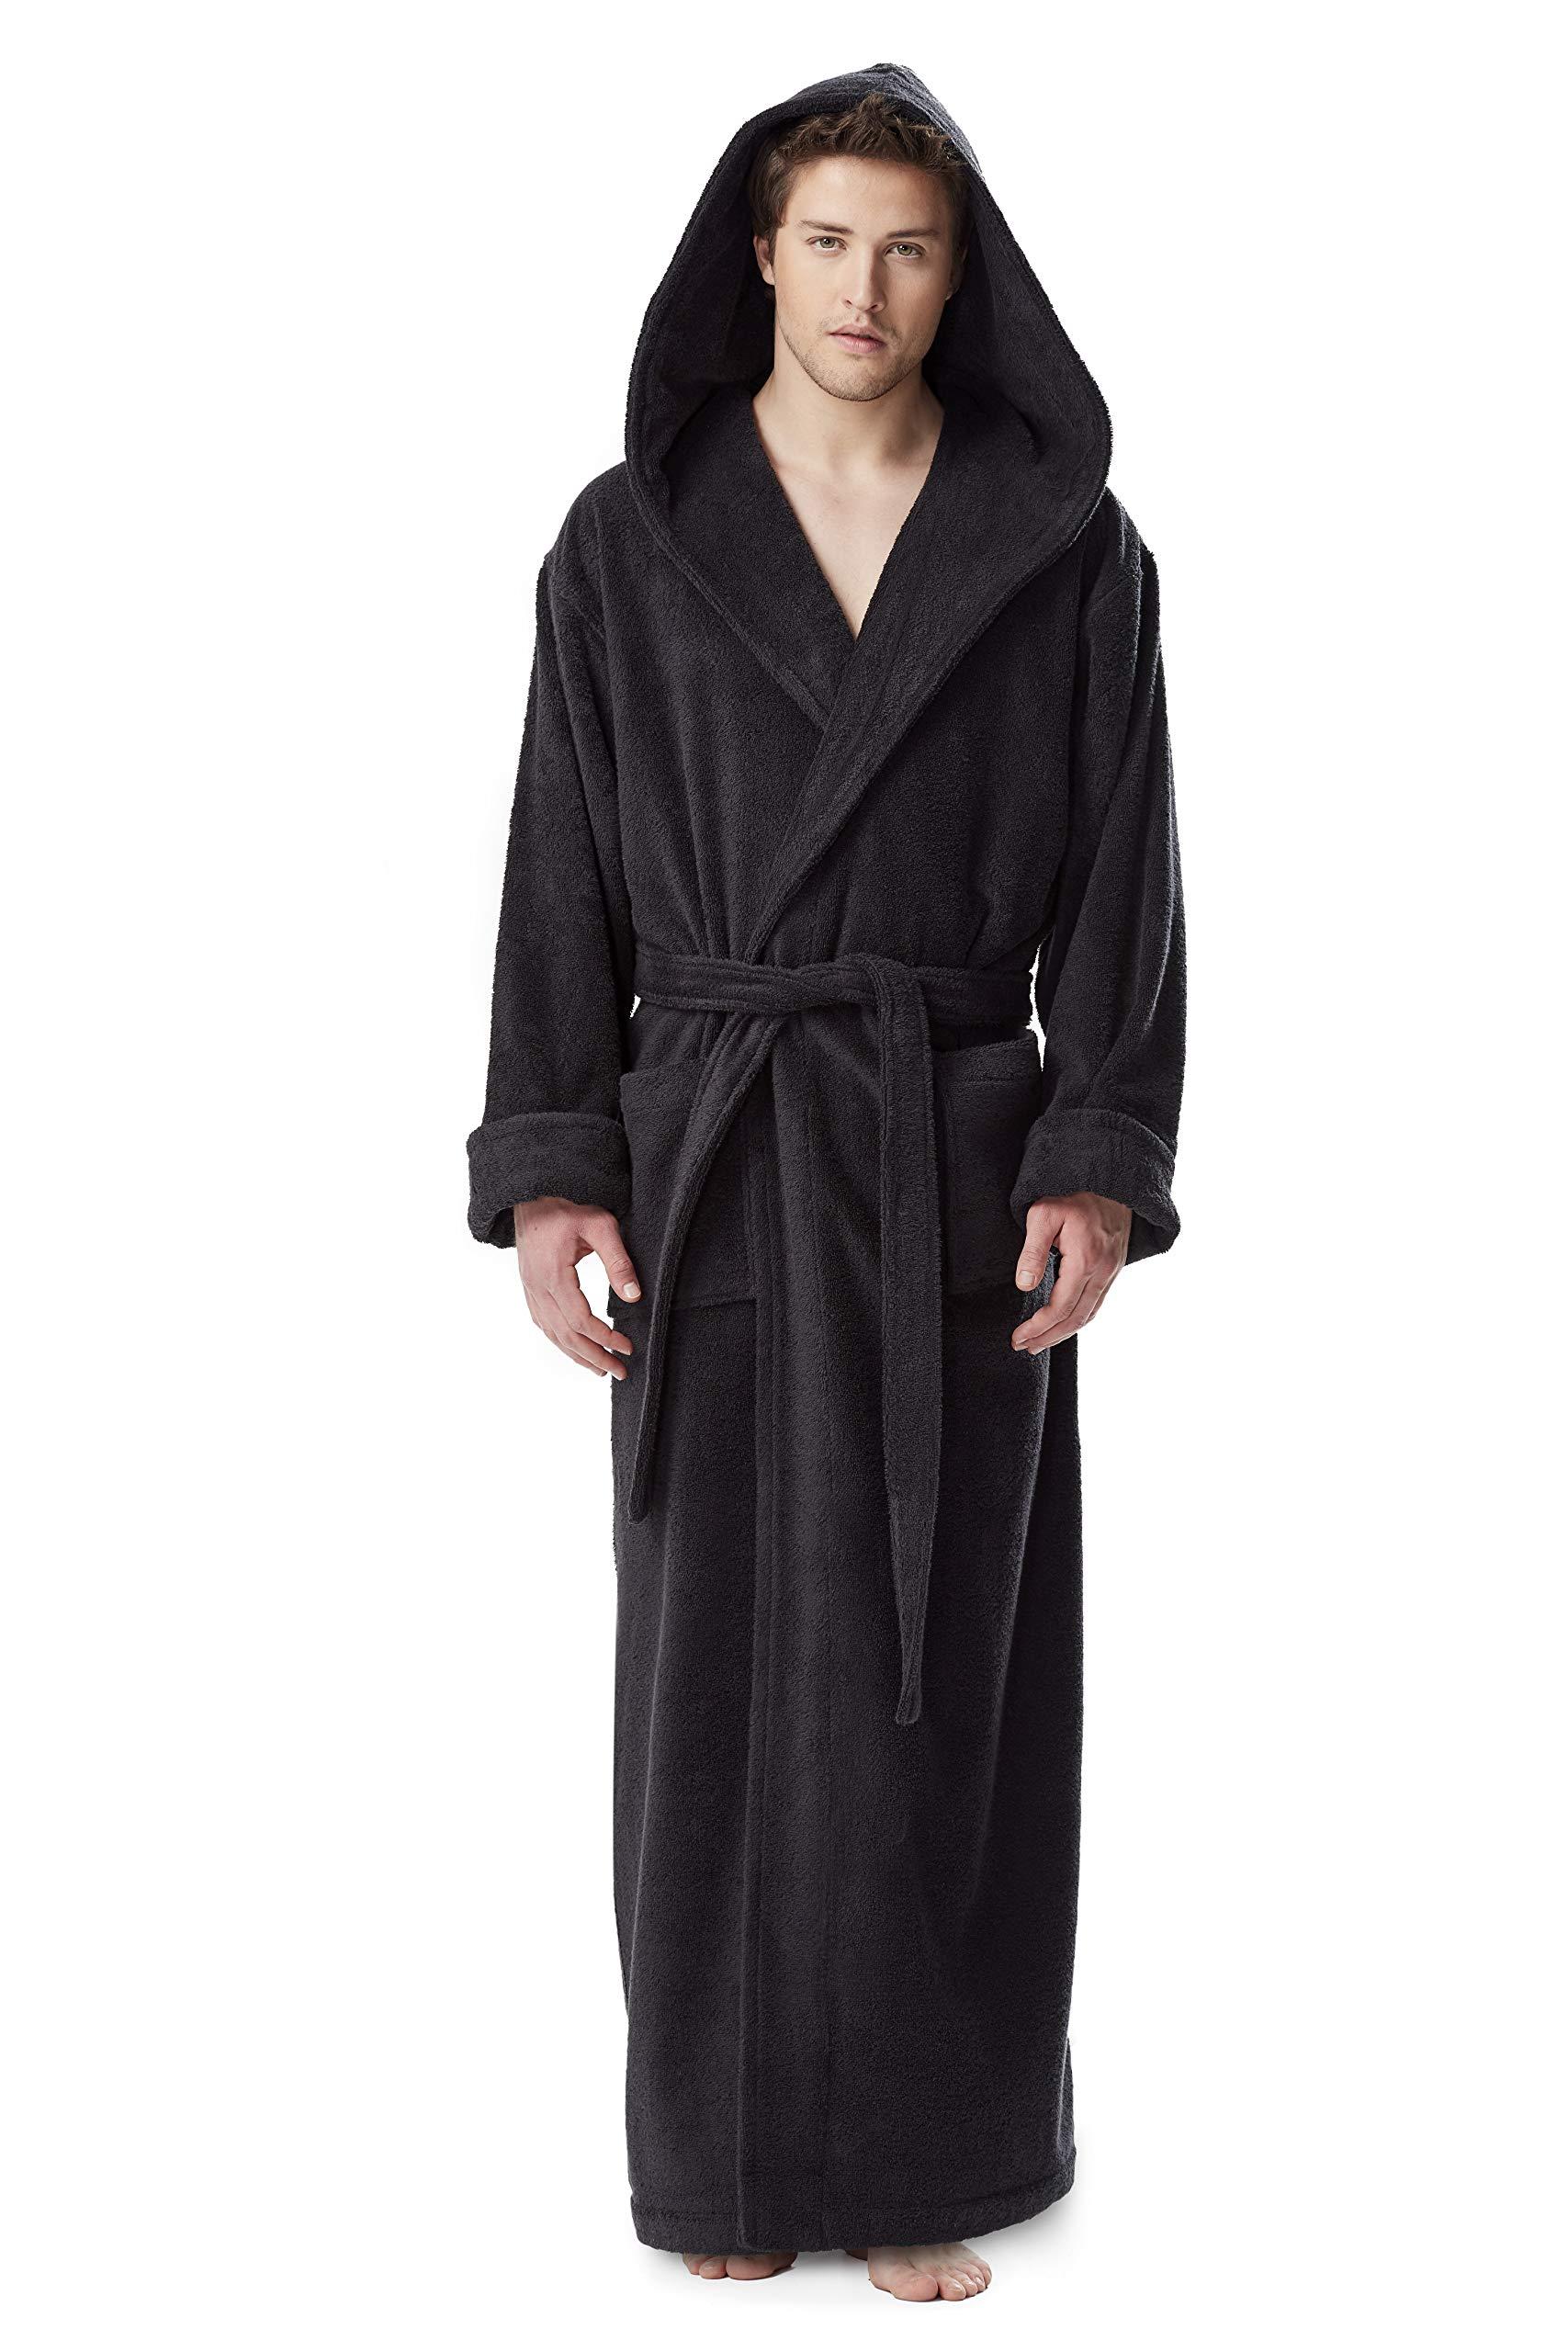 Arus Men's Hood'n Full Ankle Length Hooded Turkish Cotton Bathrobe Black Medium